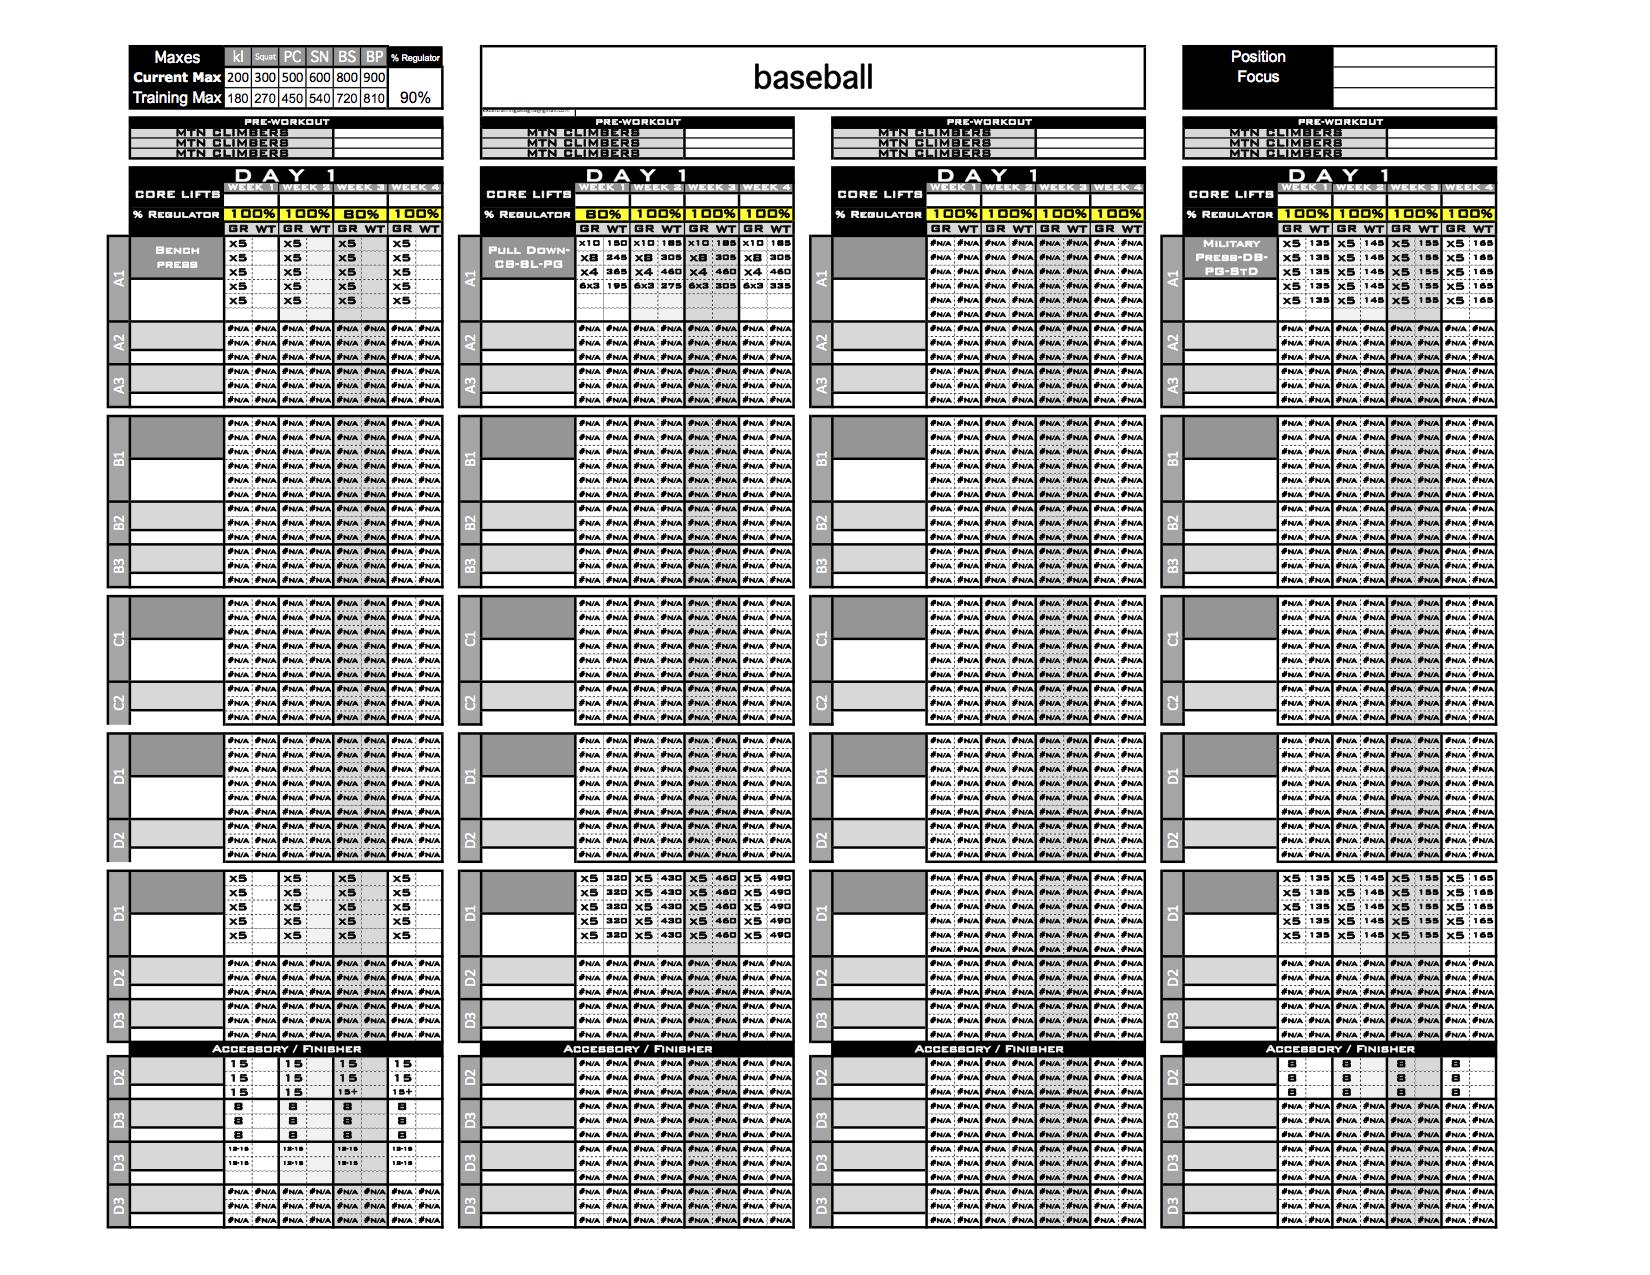 7 day work week schedule template - Romeo.landinez.co